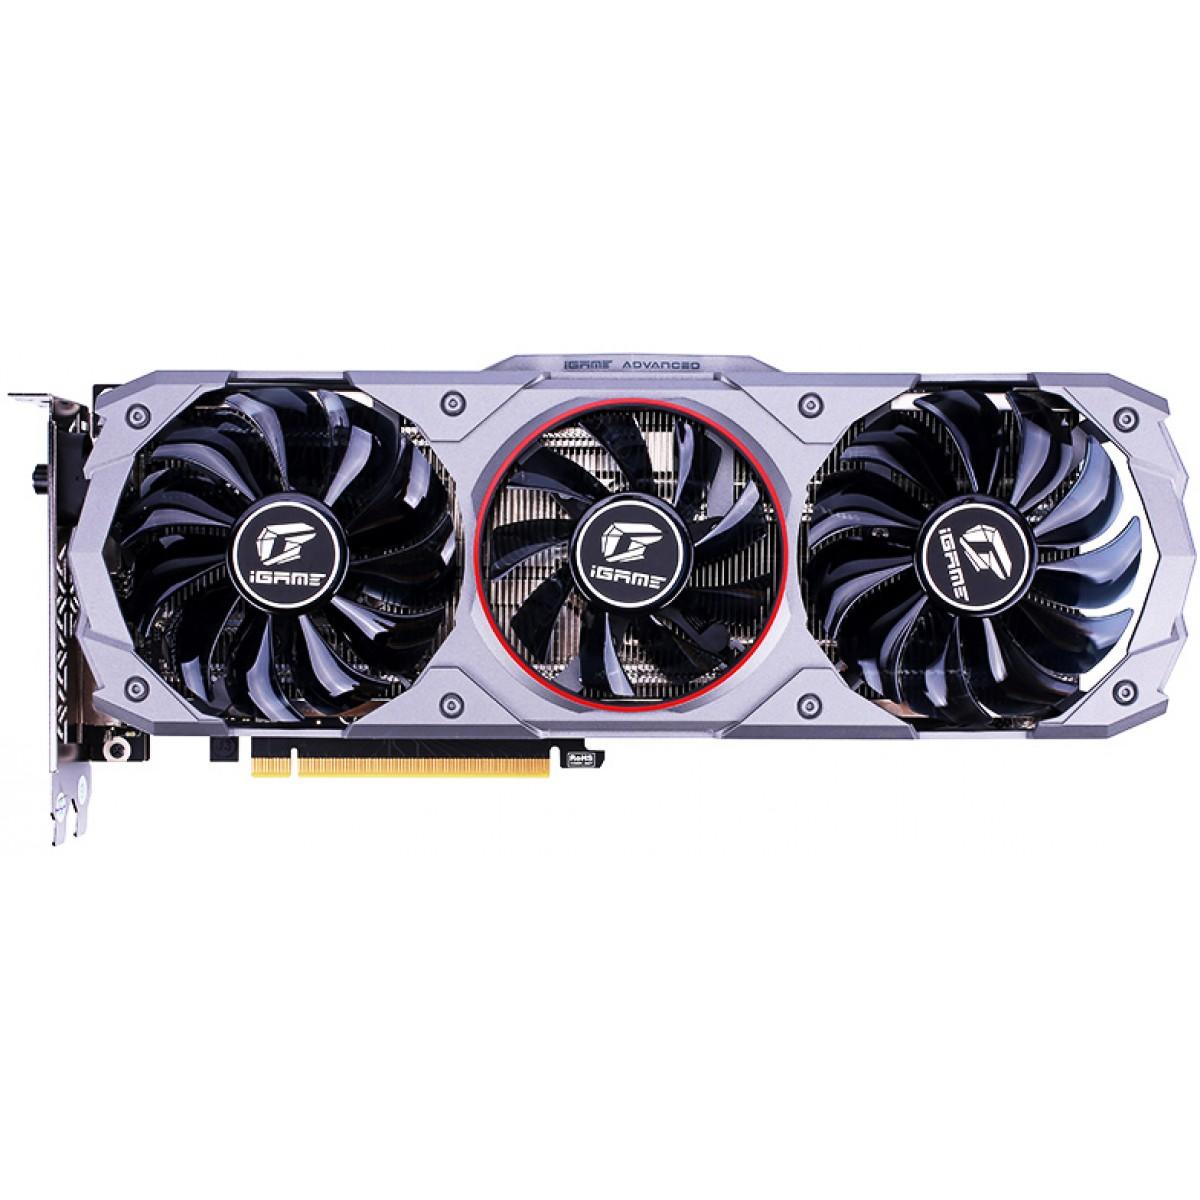 Placa de Vídeo Colorful iGame GeForce GTX 1660 Advanced OC 6G, 6GB GDDR5, 192Bit